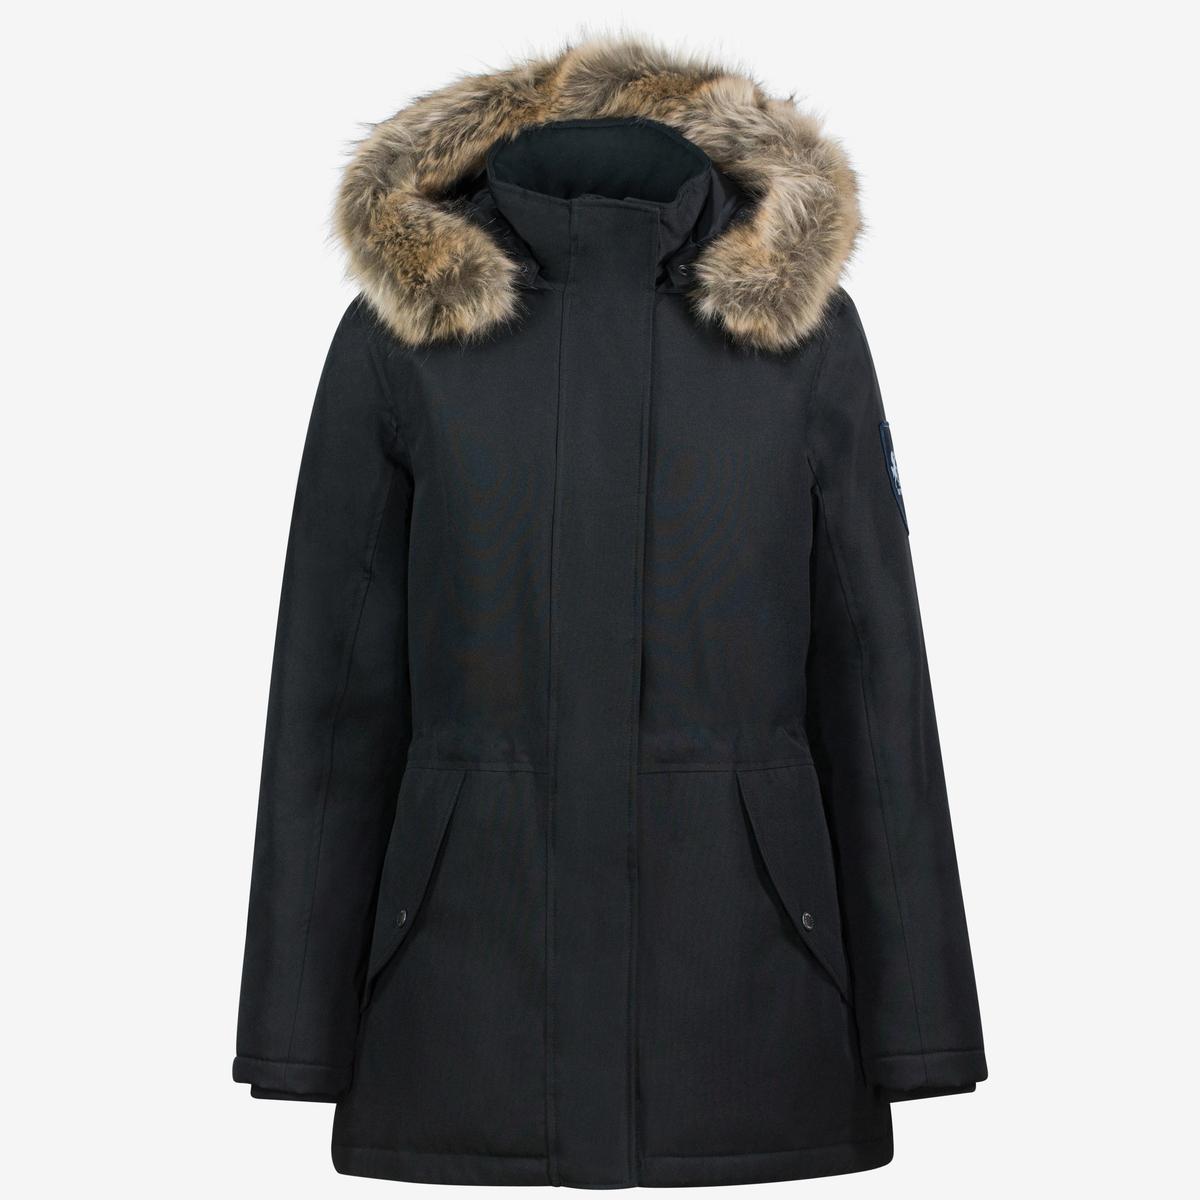 B Vertigo Estella naisten pitkä takki  97330b1549